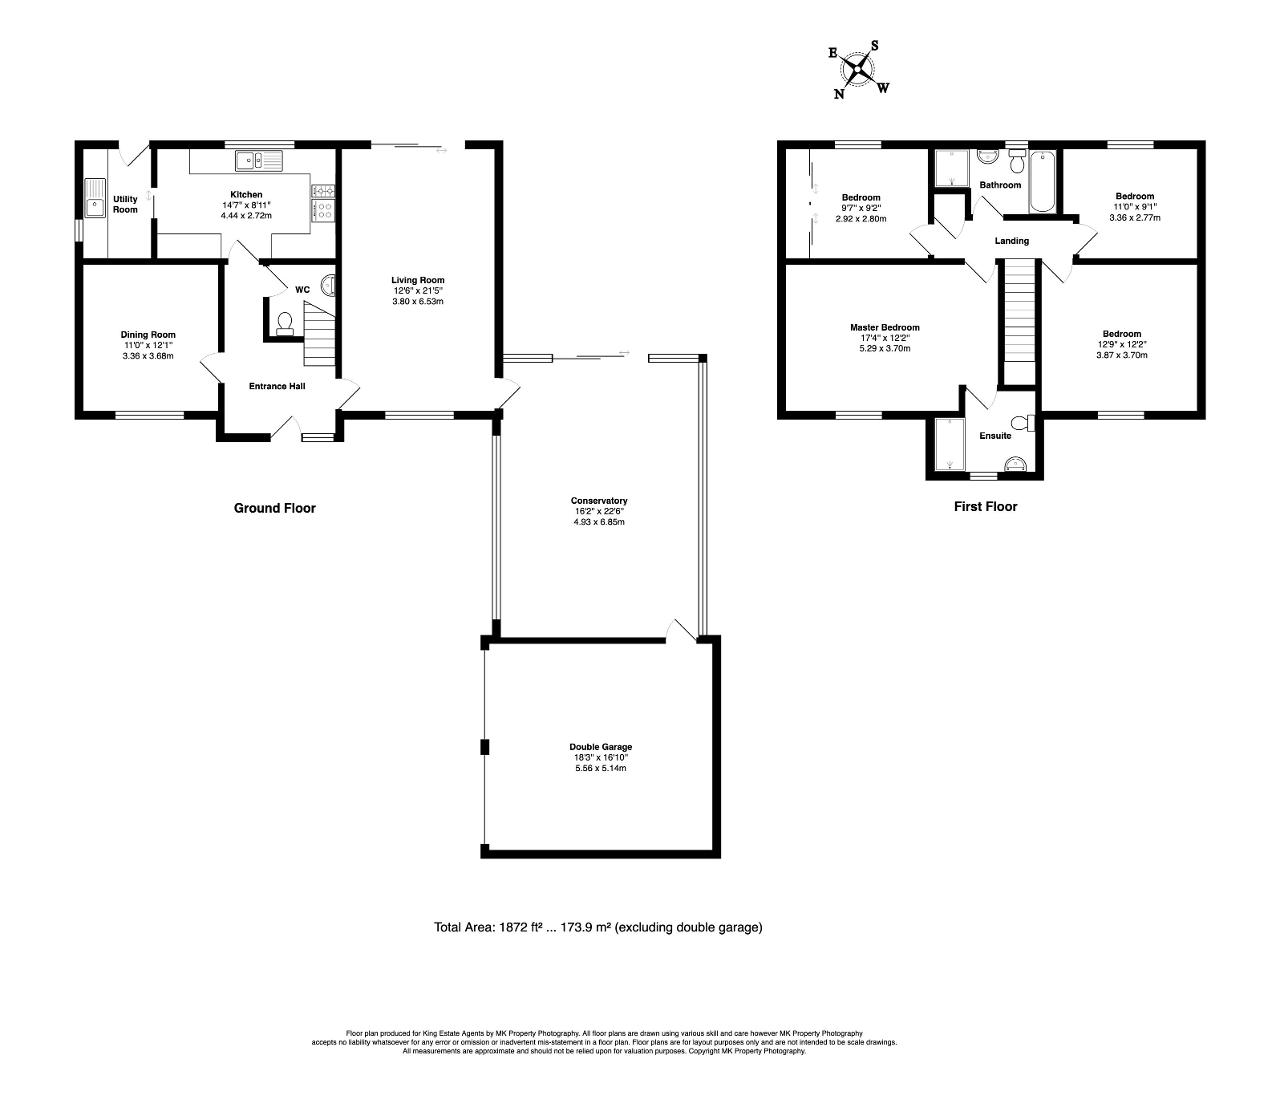 Floorplan for Rackstraw Grove, Old Farm Park, Milton Keynes, Buckinghamshire, MK7 8PZ